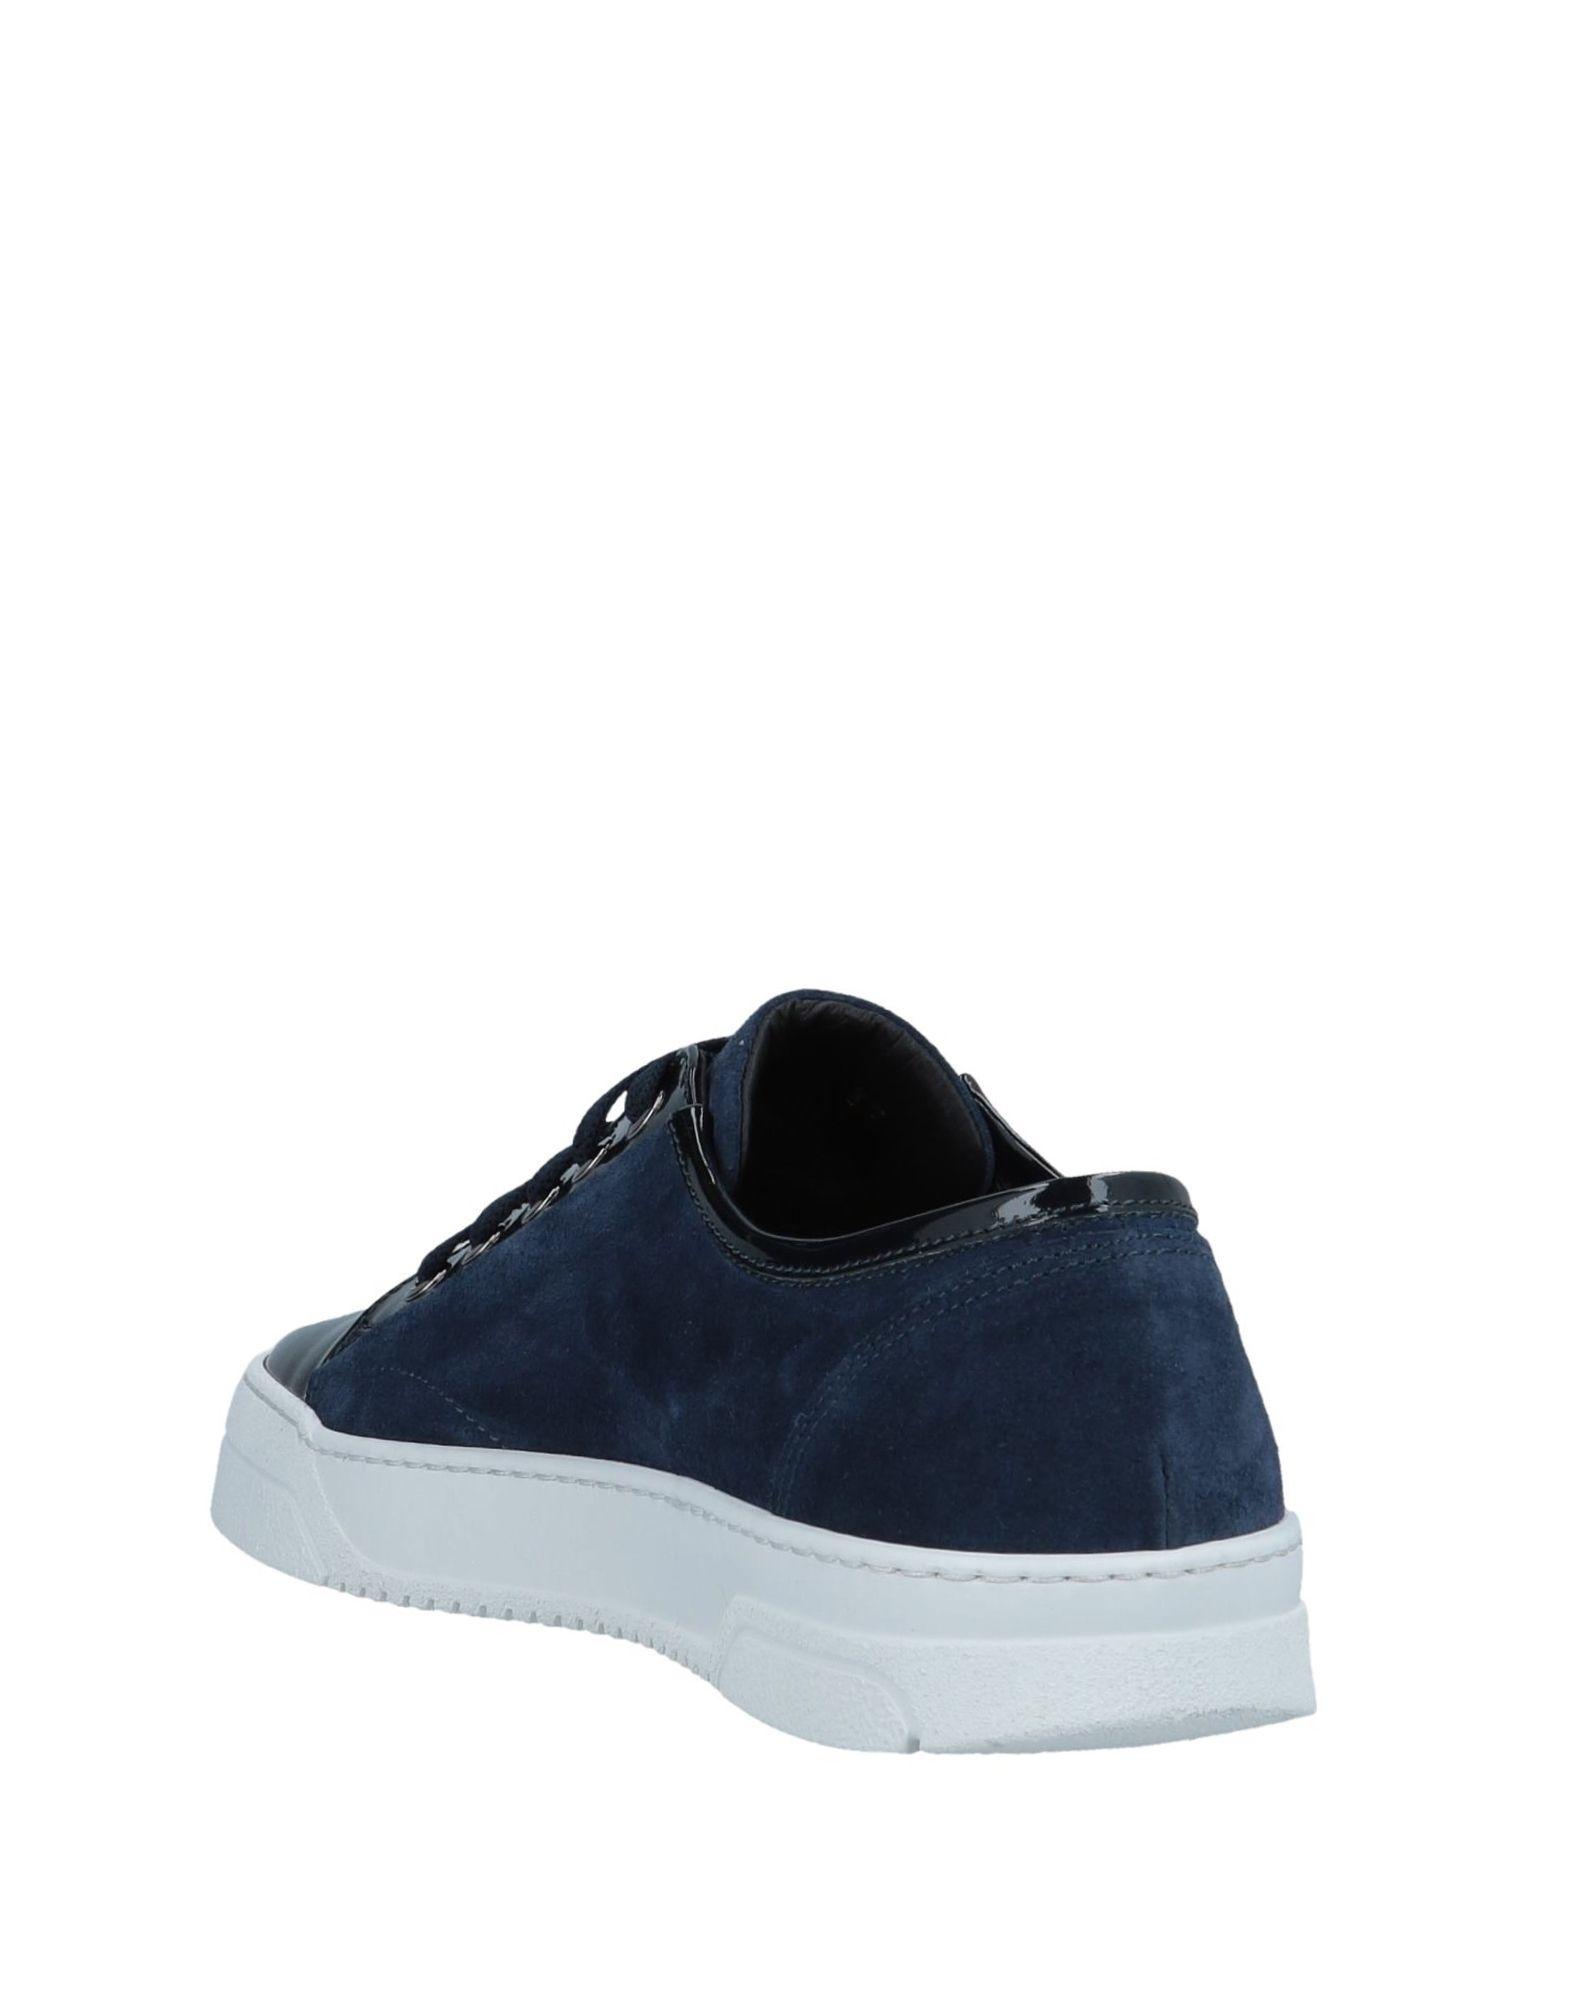 Gianfranco Lattanzi Sneakers Damen  11548046KJGut aussehende strapazierfähige Schuhe